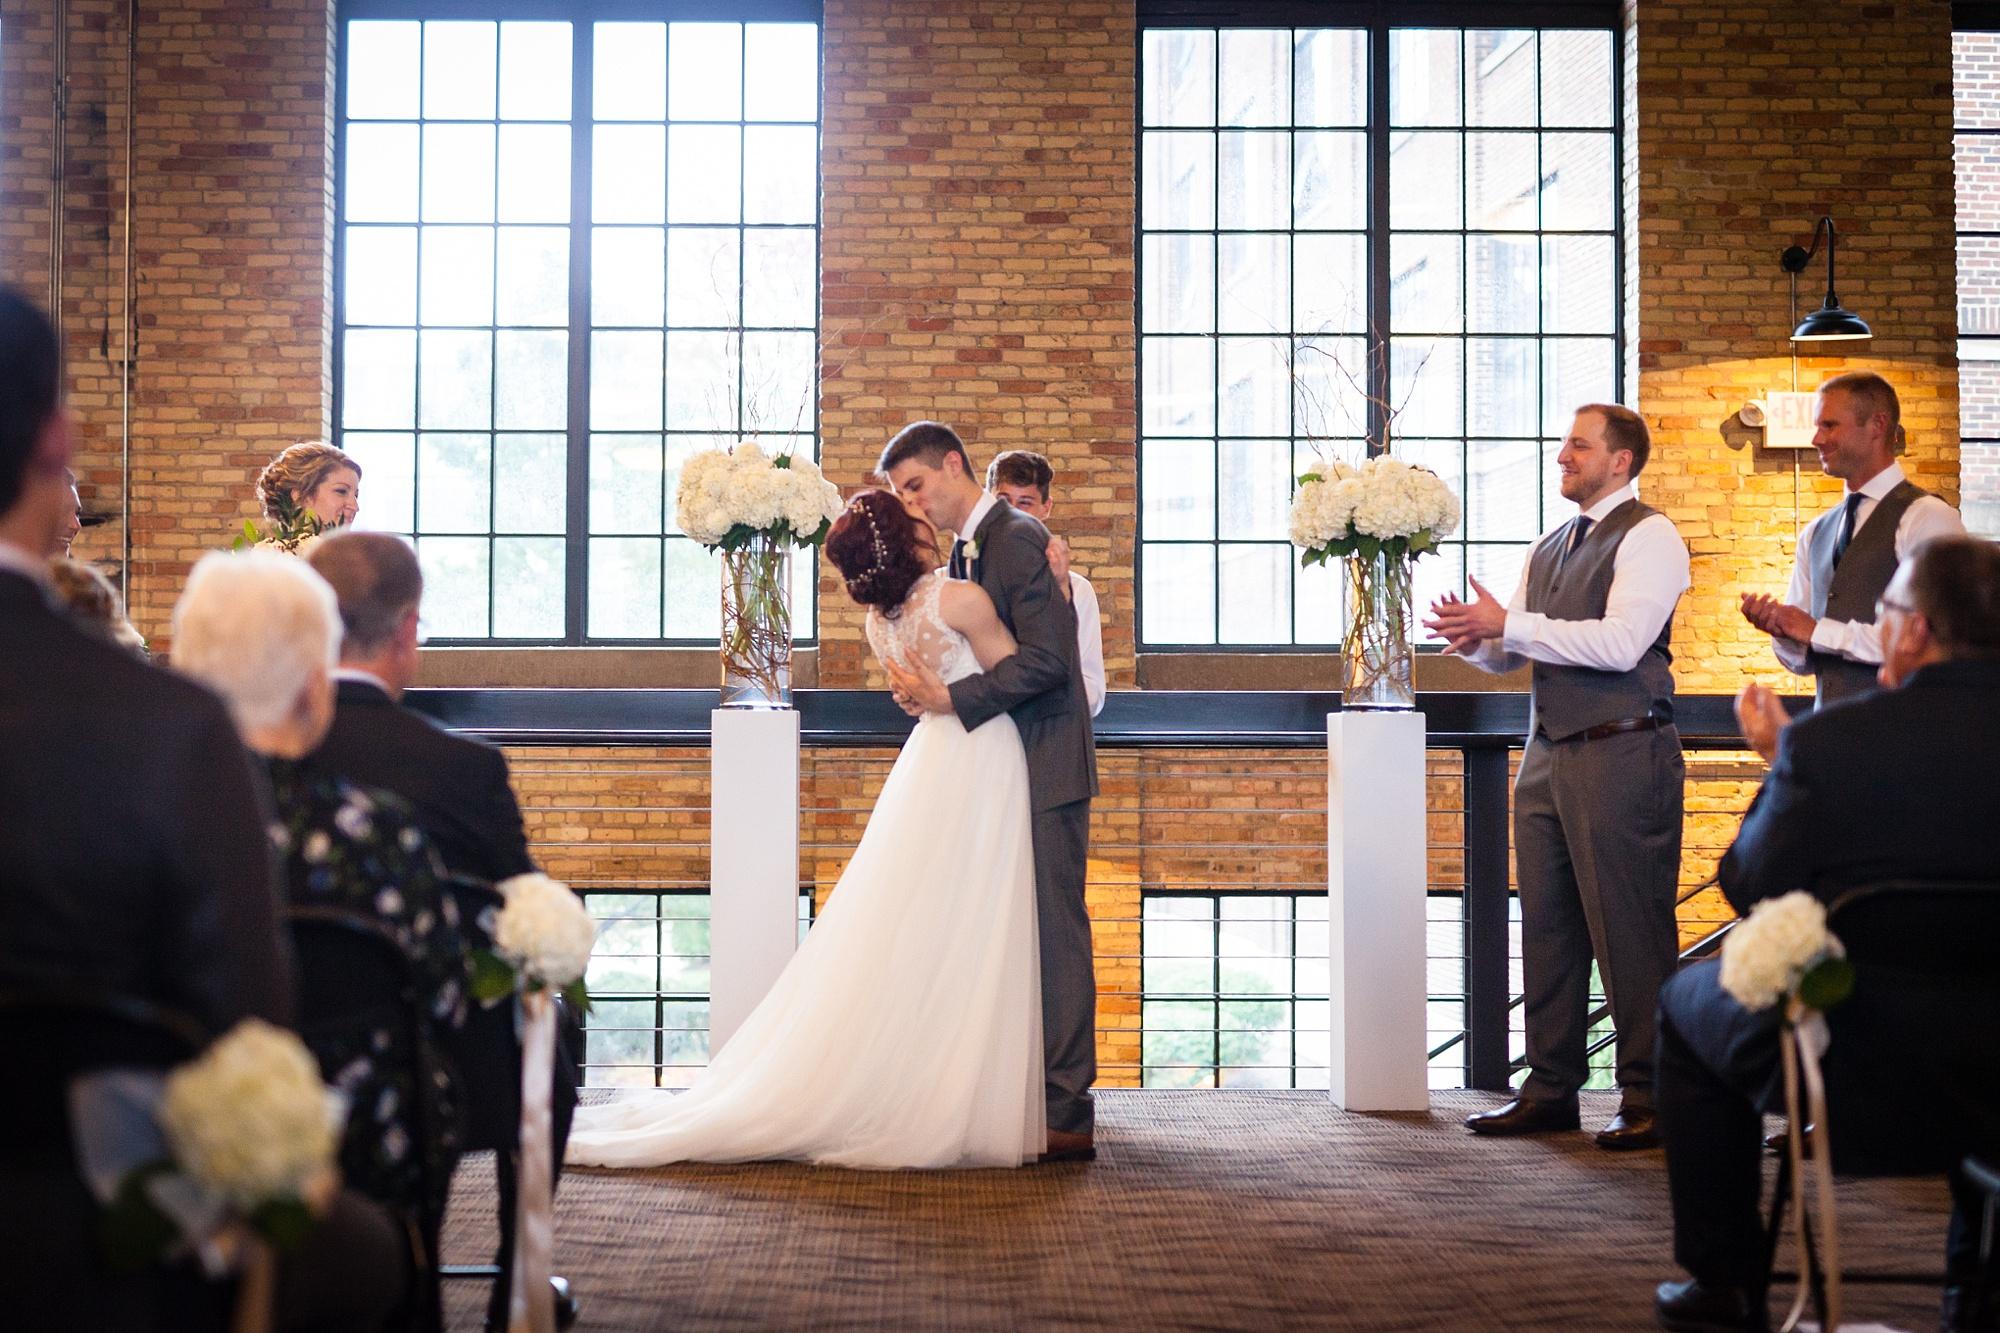 Brandon_Shafer_Photography_Lauren_Ethan_New_Vintage_Place_Grand_Rapids_Wedding_0039.jpg